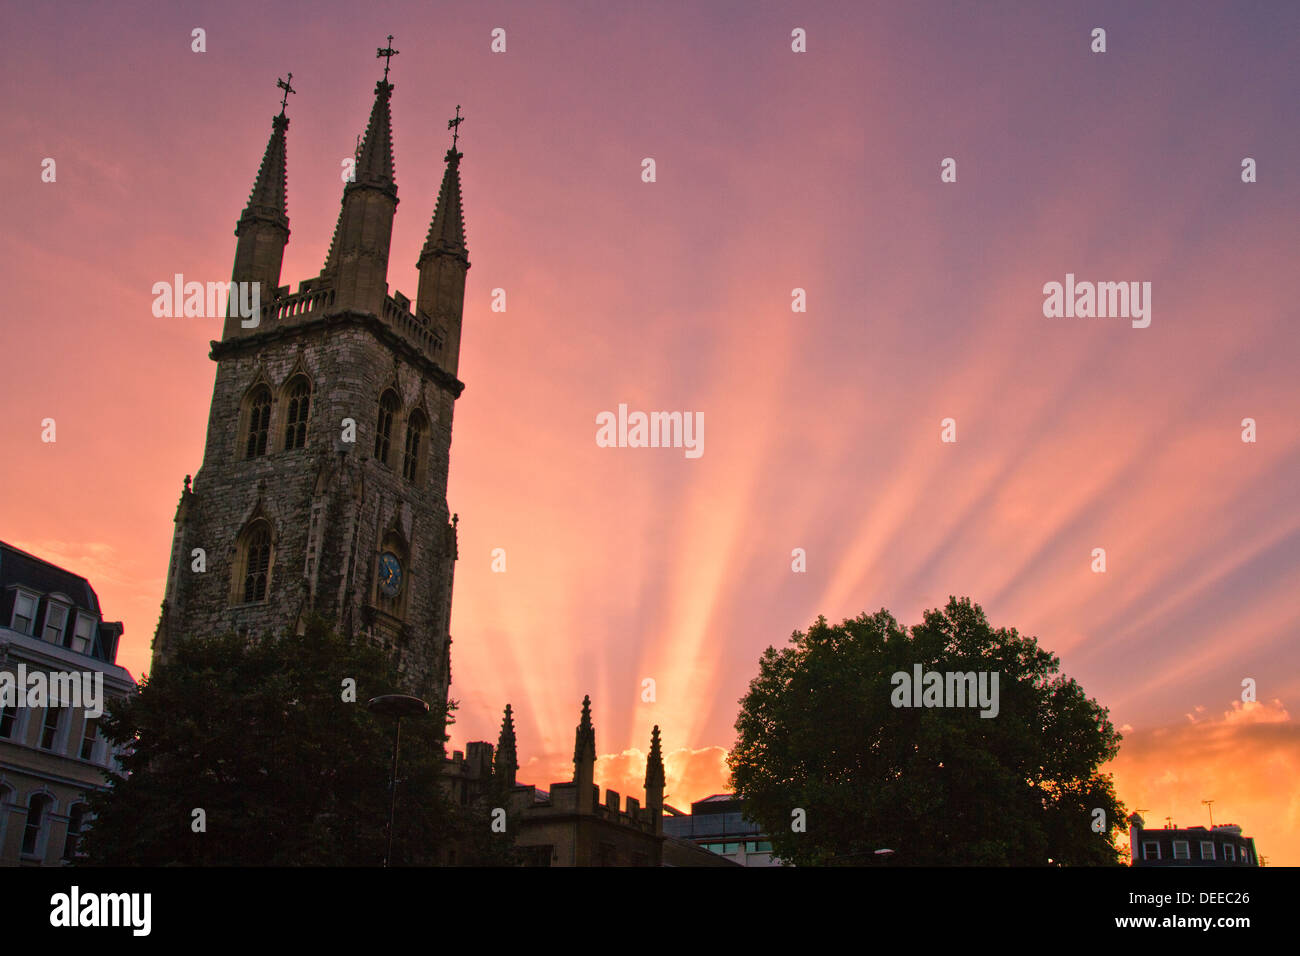 Sunrise starburst over the City of London - Stock Image